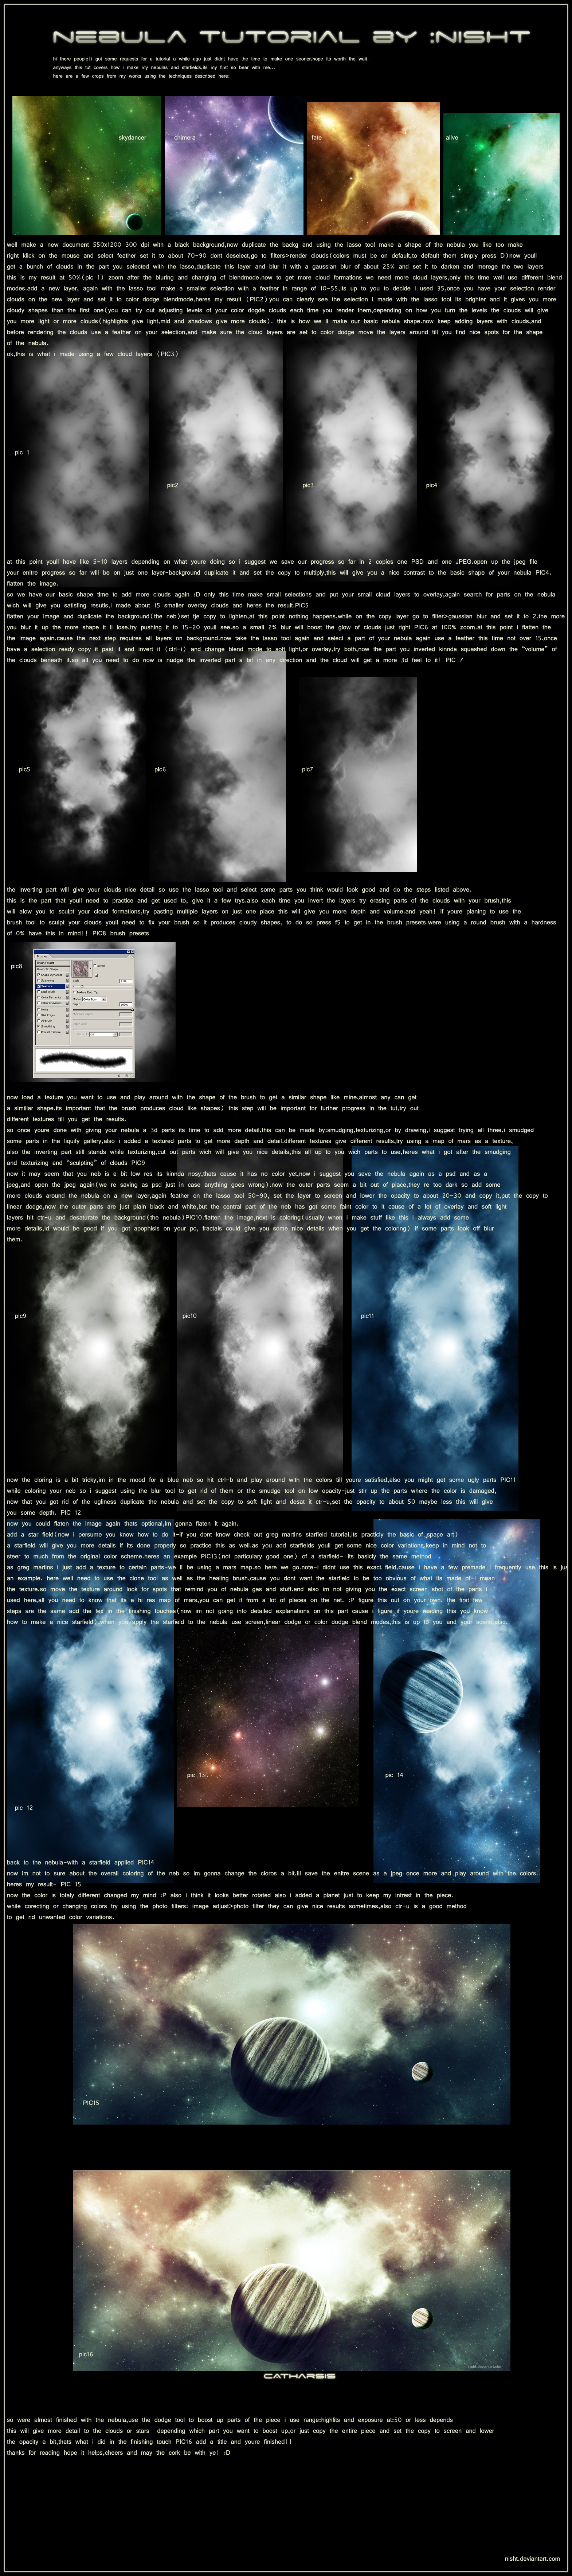 nebula tutorial by nisht by nisht